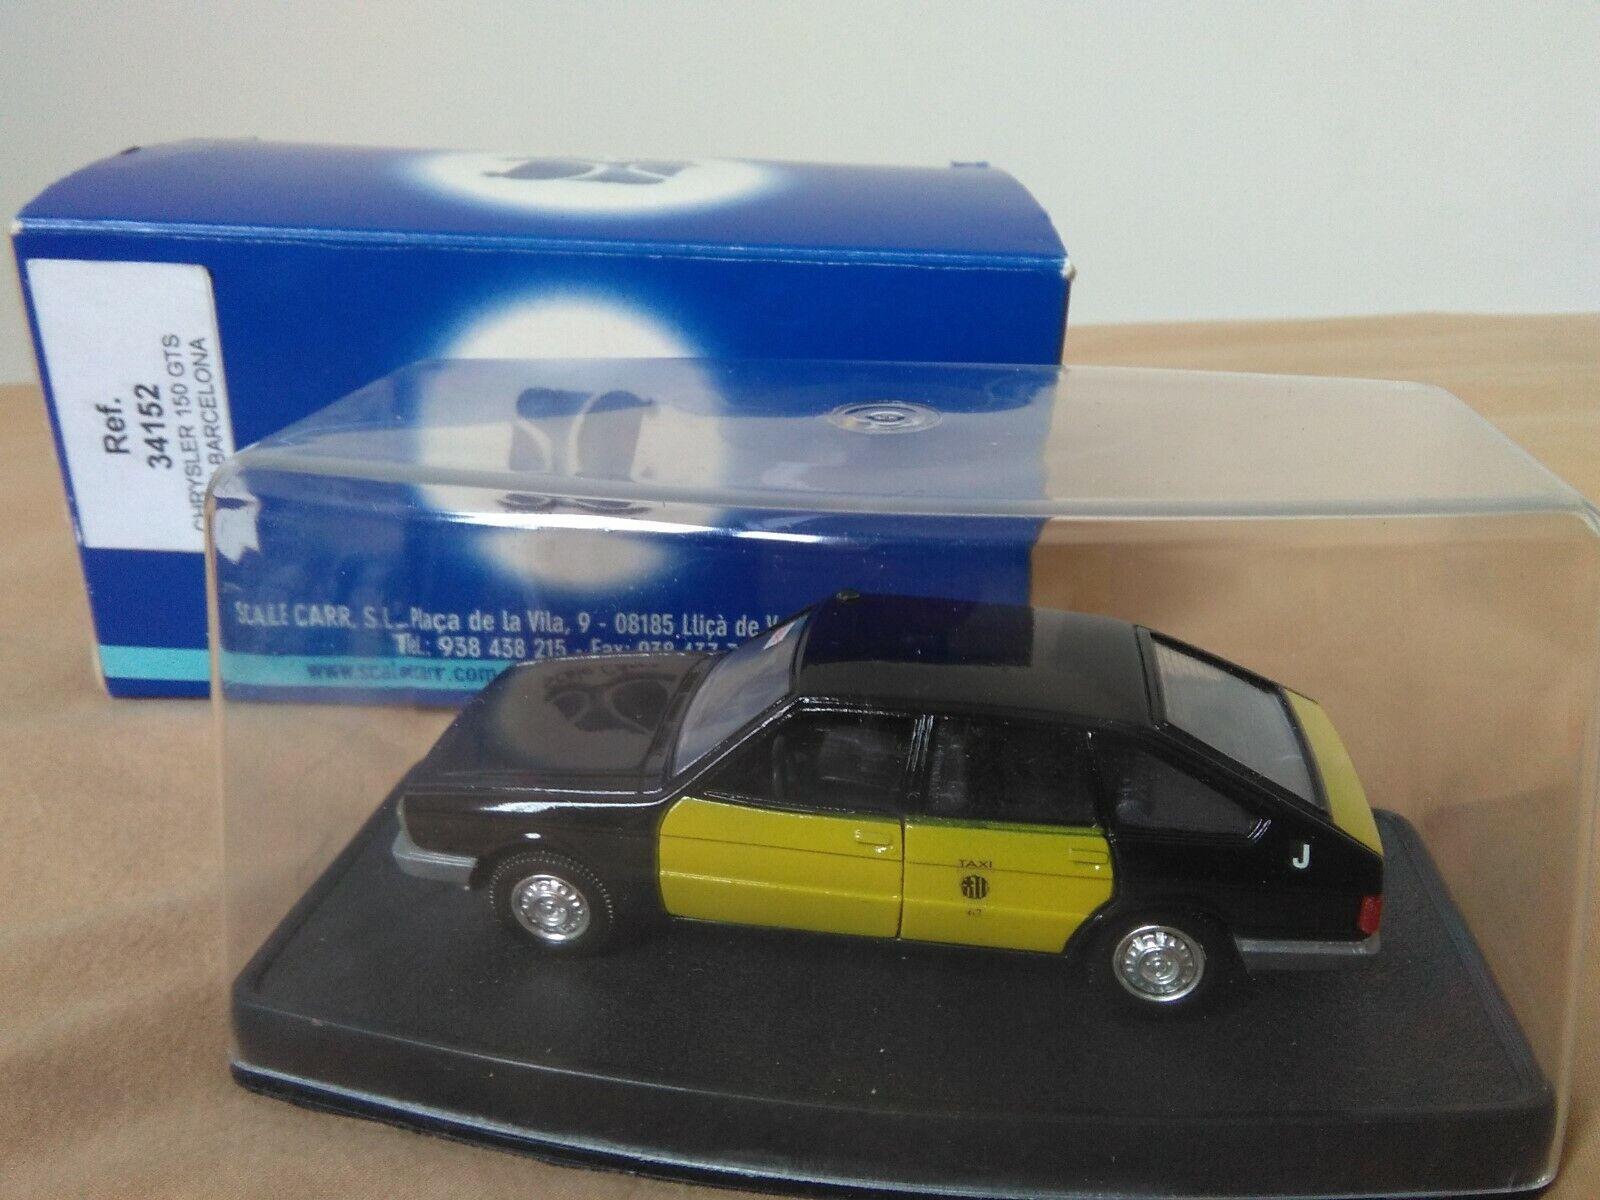 Antigua miniatura 1 43 Scale voiturer 34152 Chrysler 150 GTS Taxi de Barcelona.